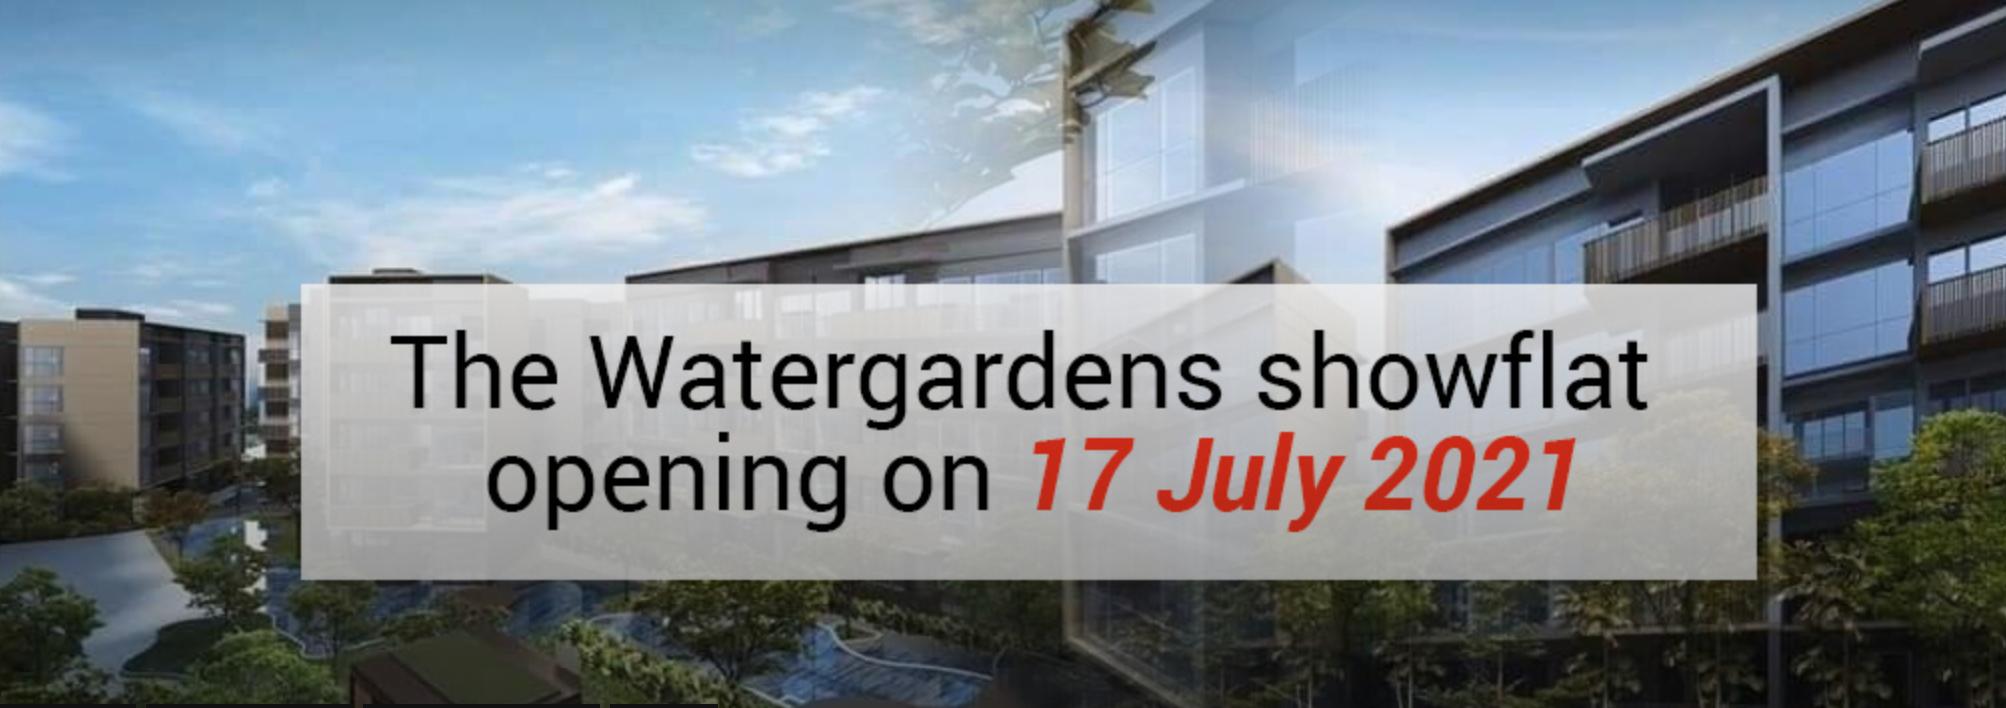 the watergardens showflat opening